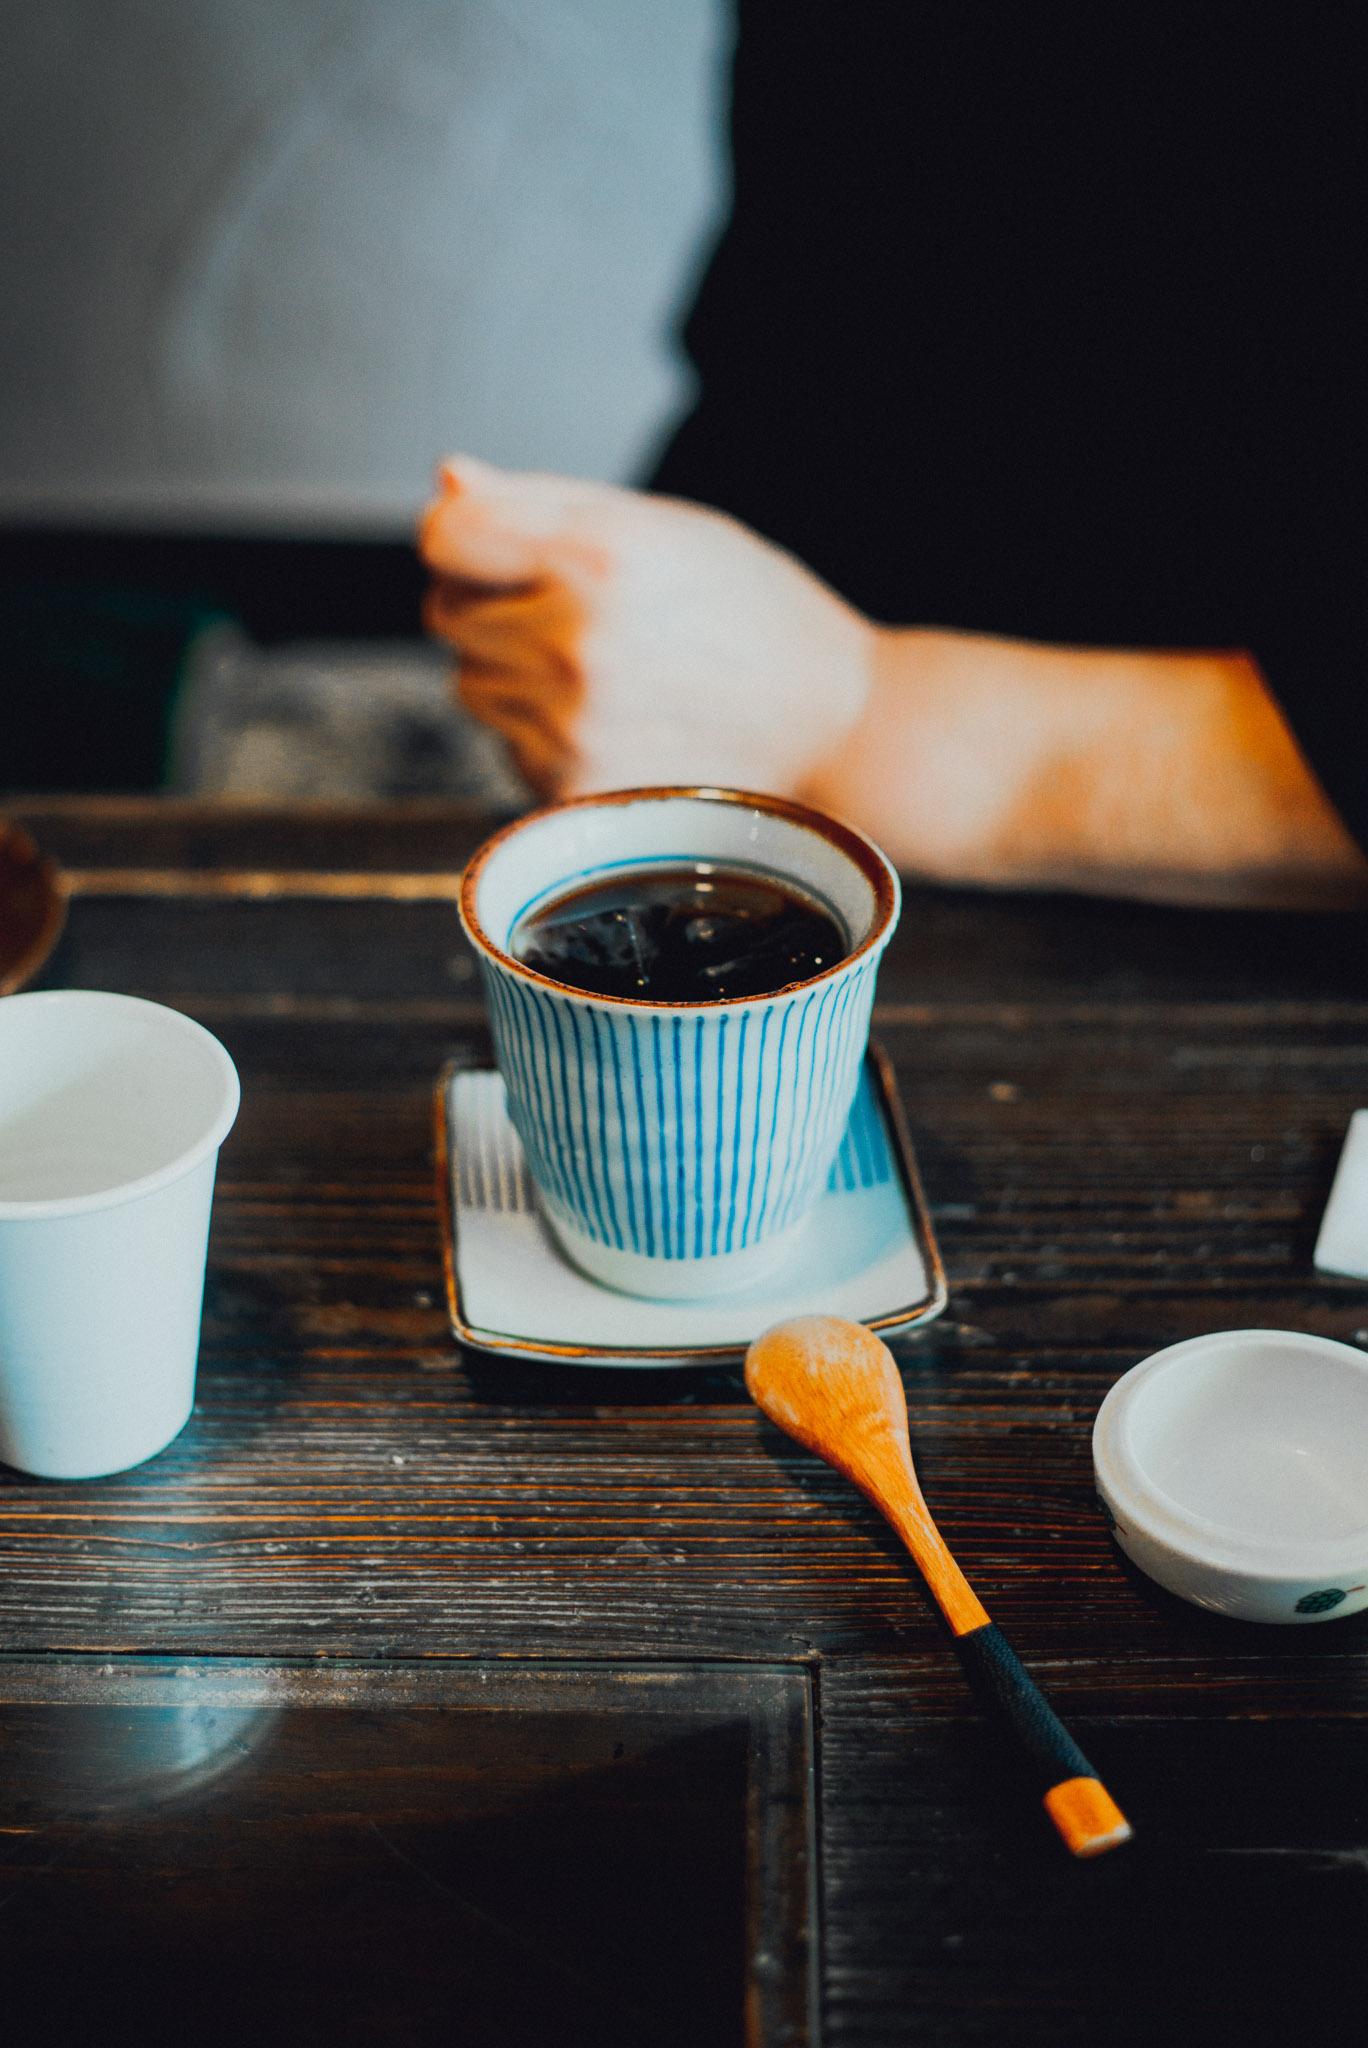 leica-mp-240-photographer-japanese-coffee